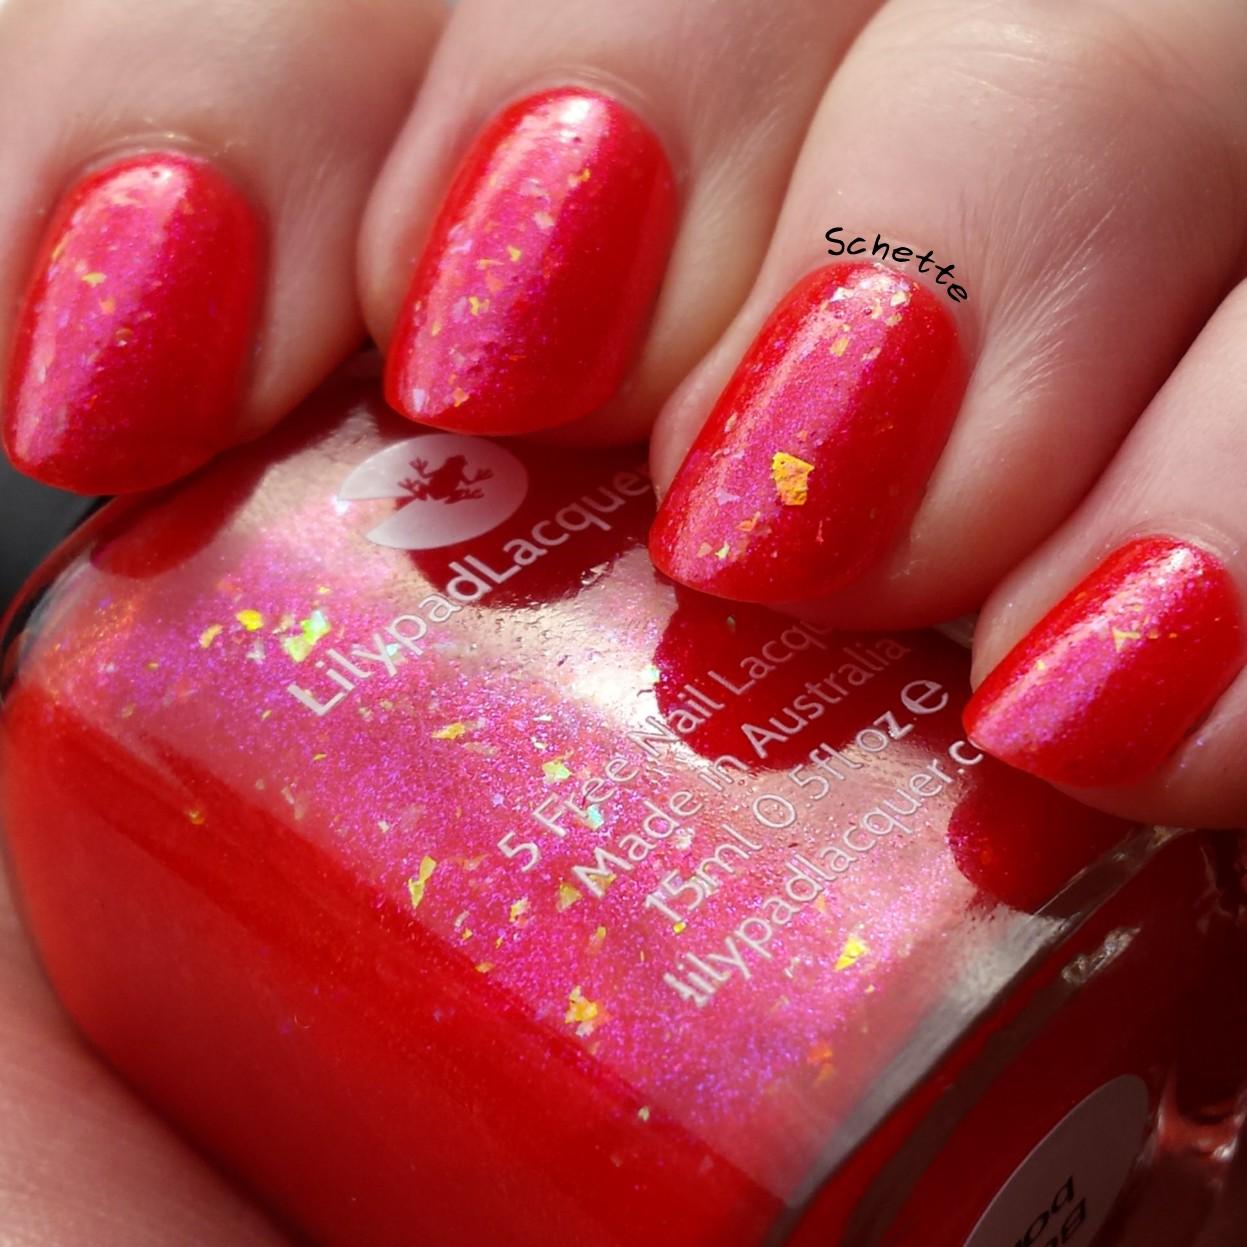 Lilypad Lacquer - Bon Bon